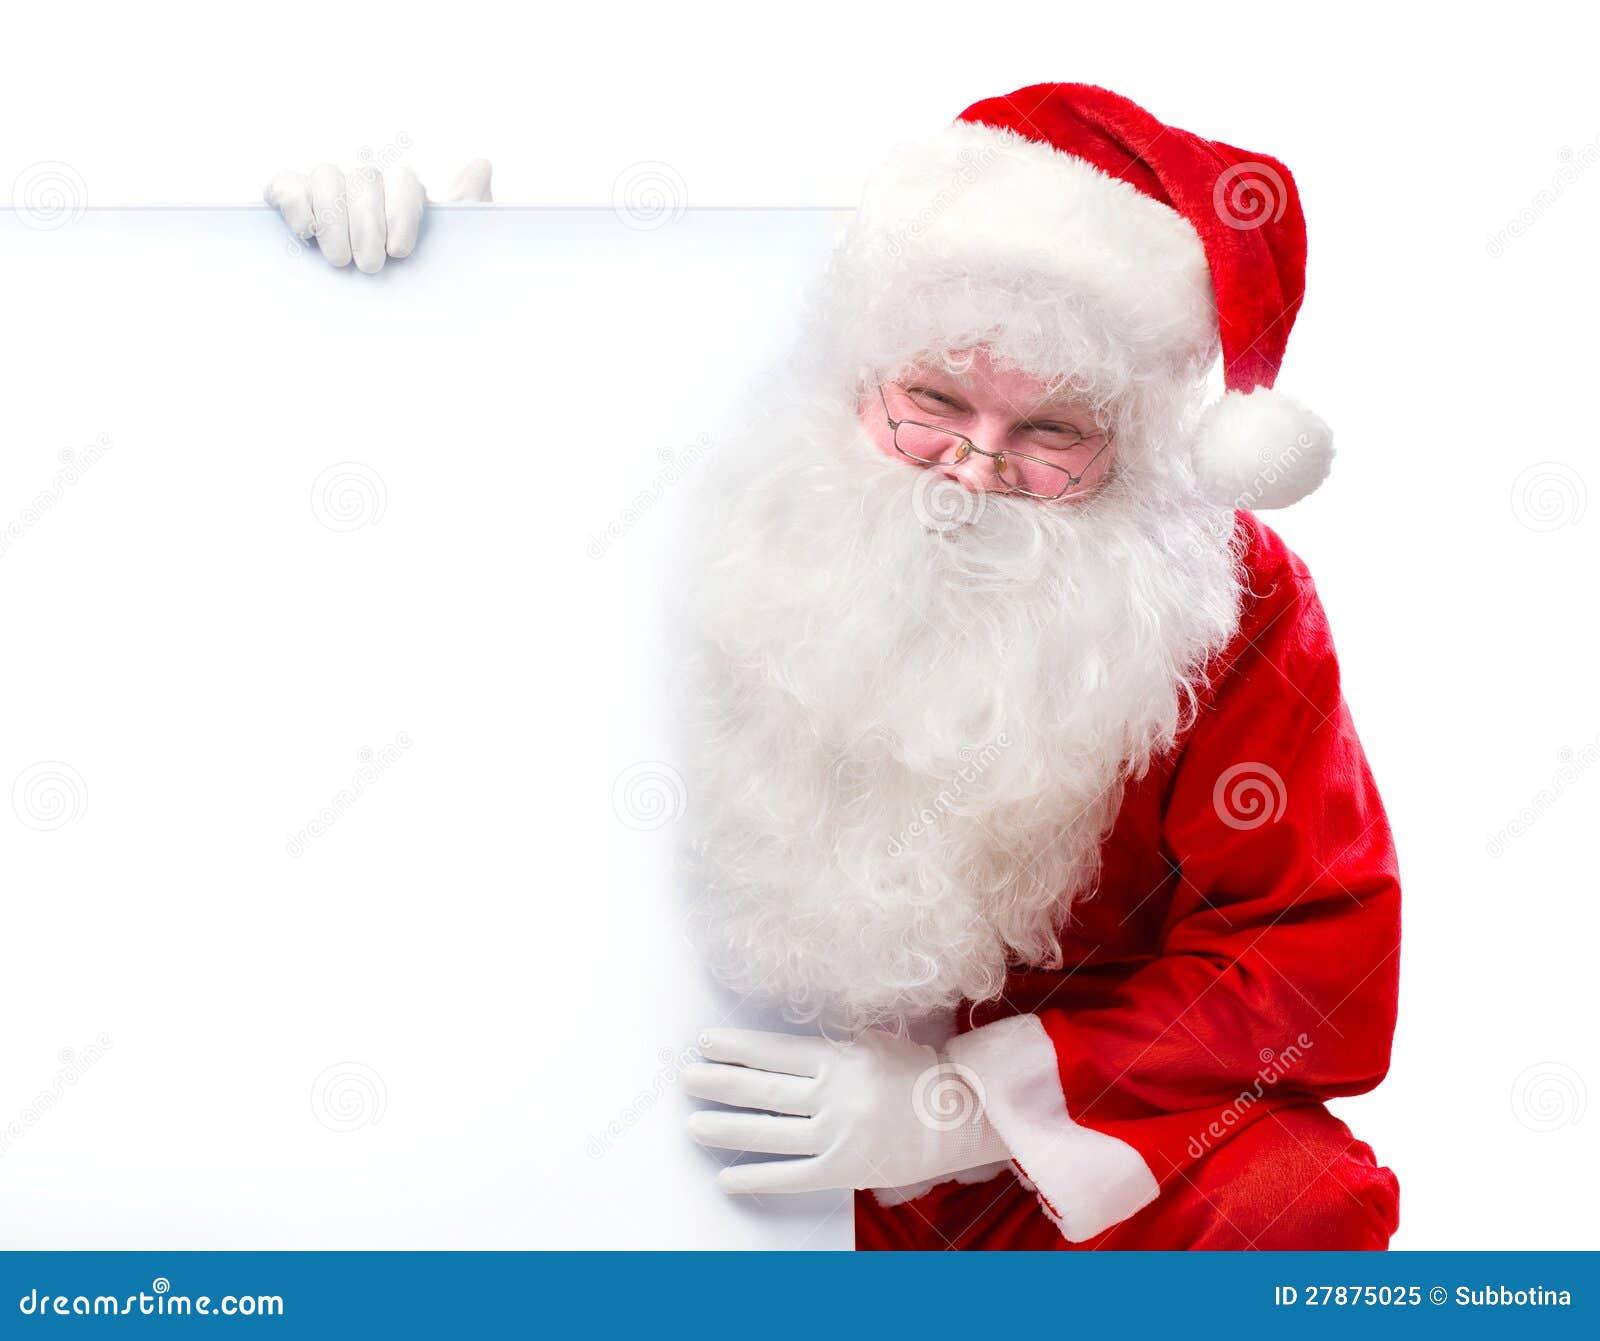 Santa Claus Holding Banner Royalty Free Stock Photo - Image: 27875025